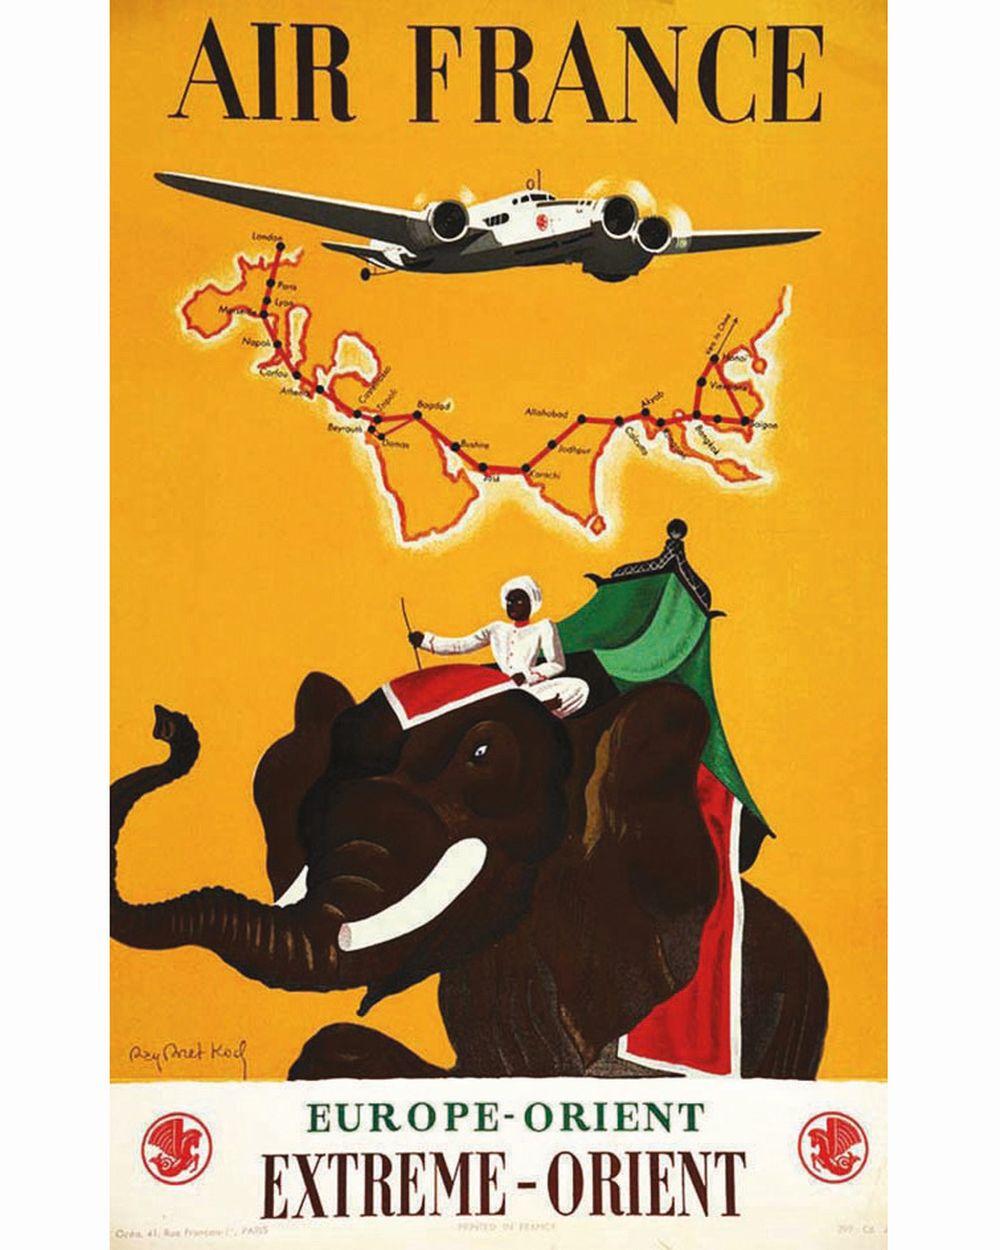 KOCH R.B. - Extrème Orient Europe Orient Air France Très Rare     vers 1930